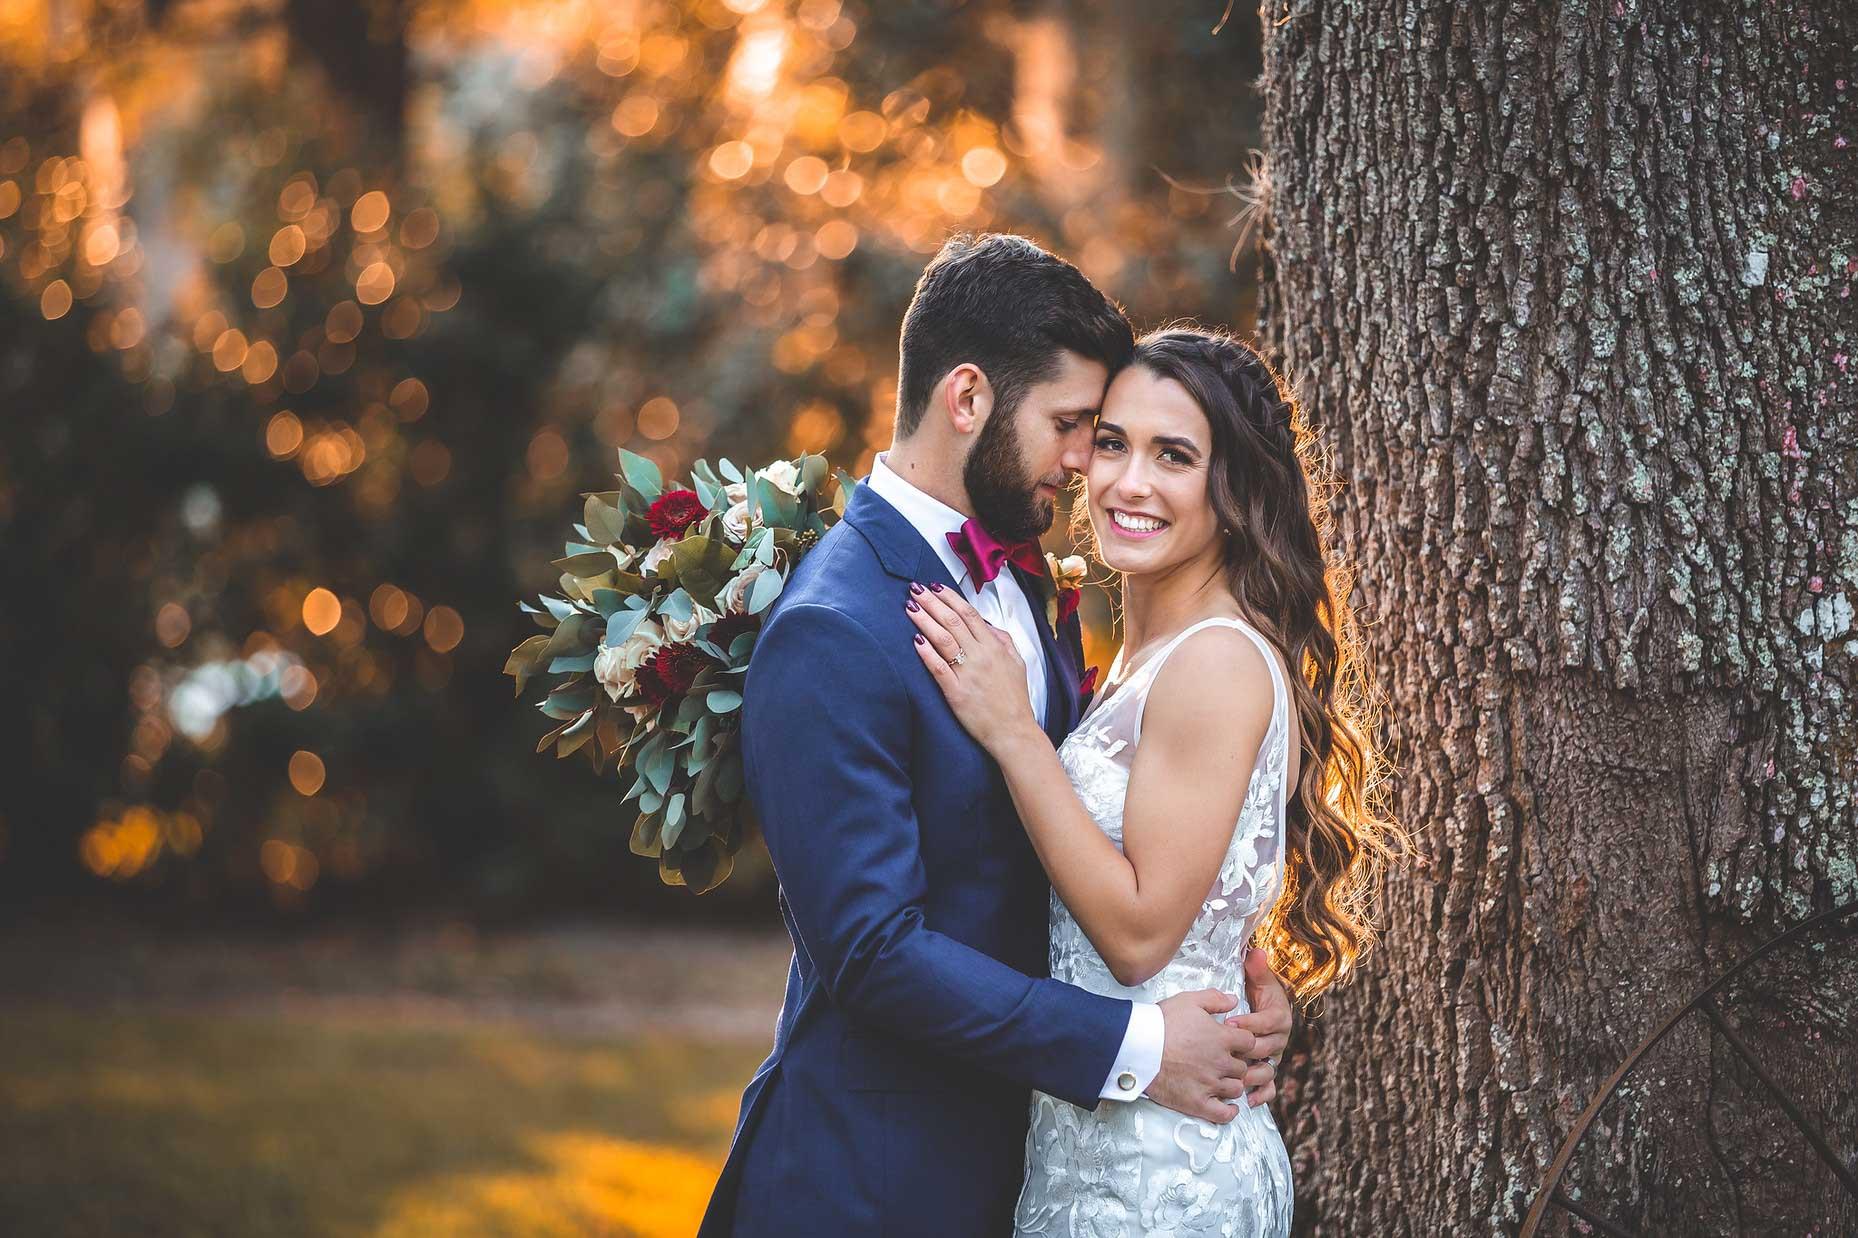 adam-szarmack-bowing-oaks-wedding-photographer-jacksonville-107.jpg